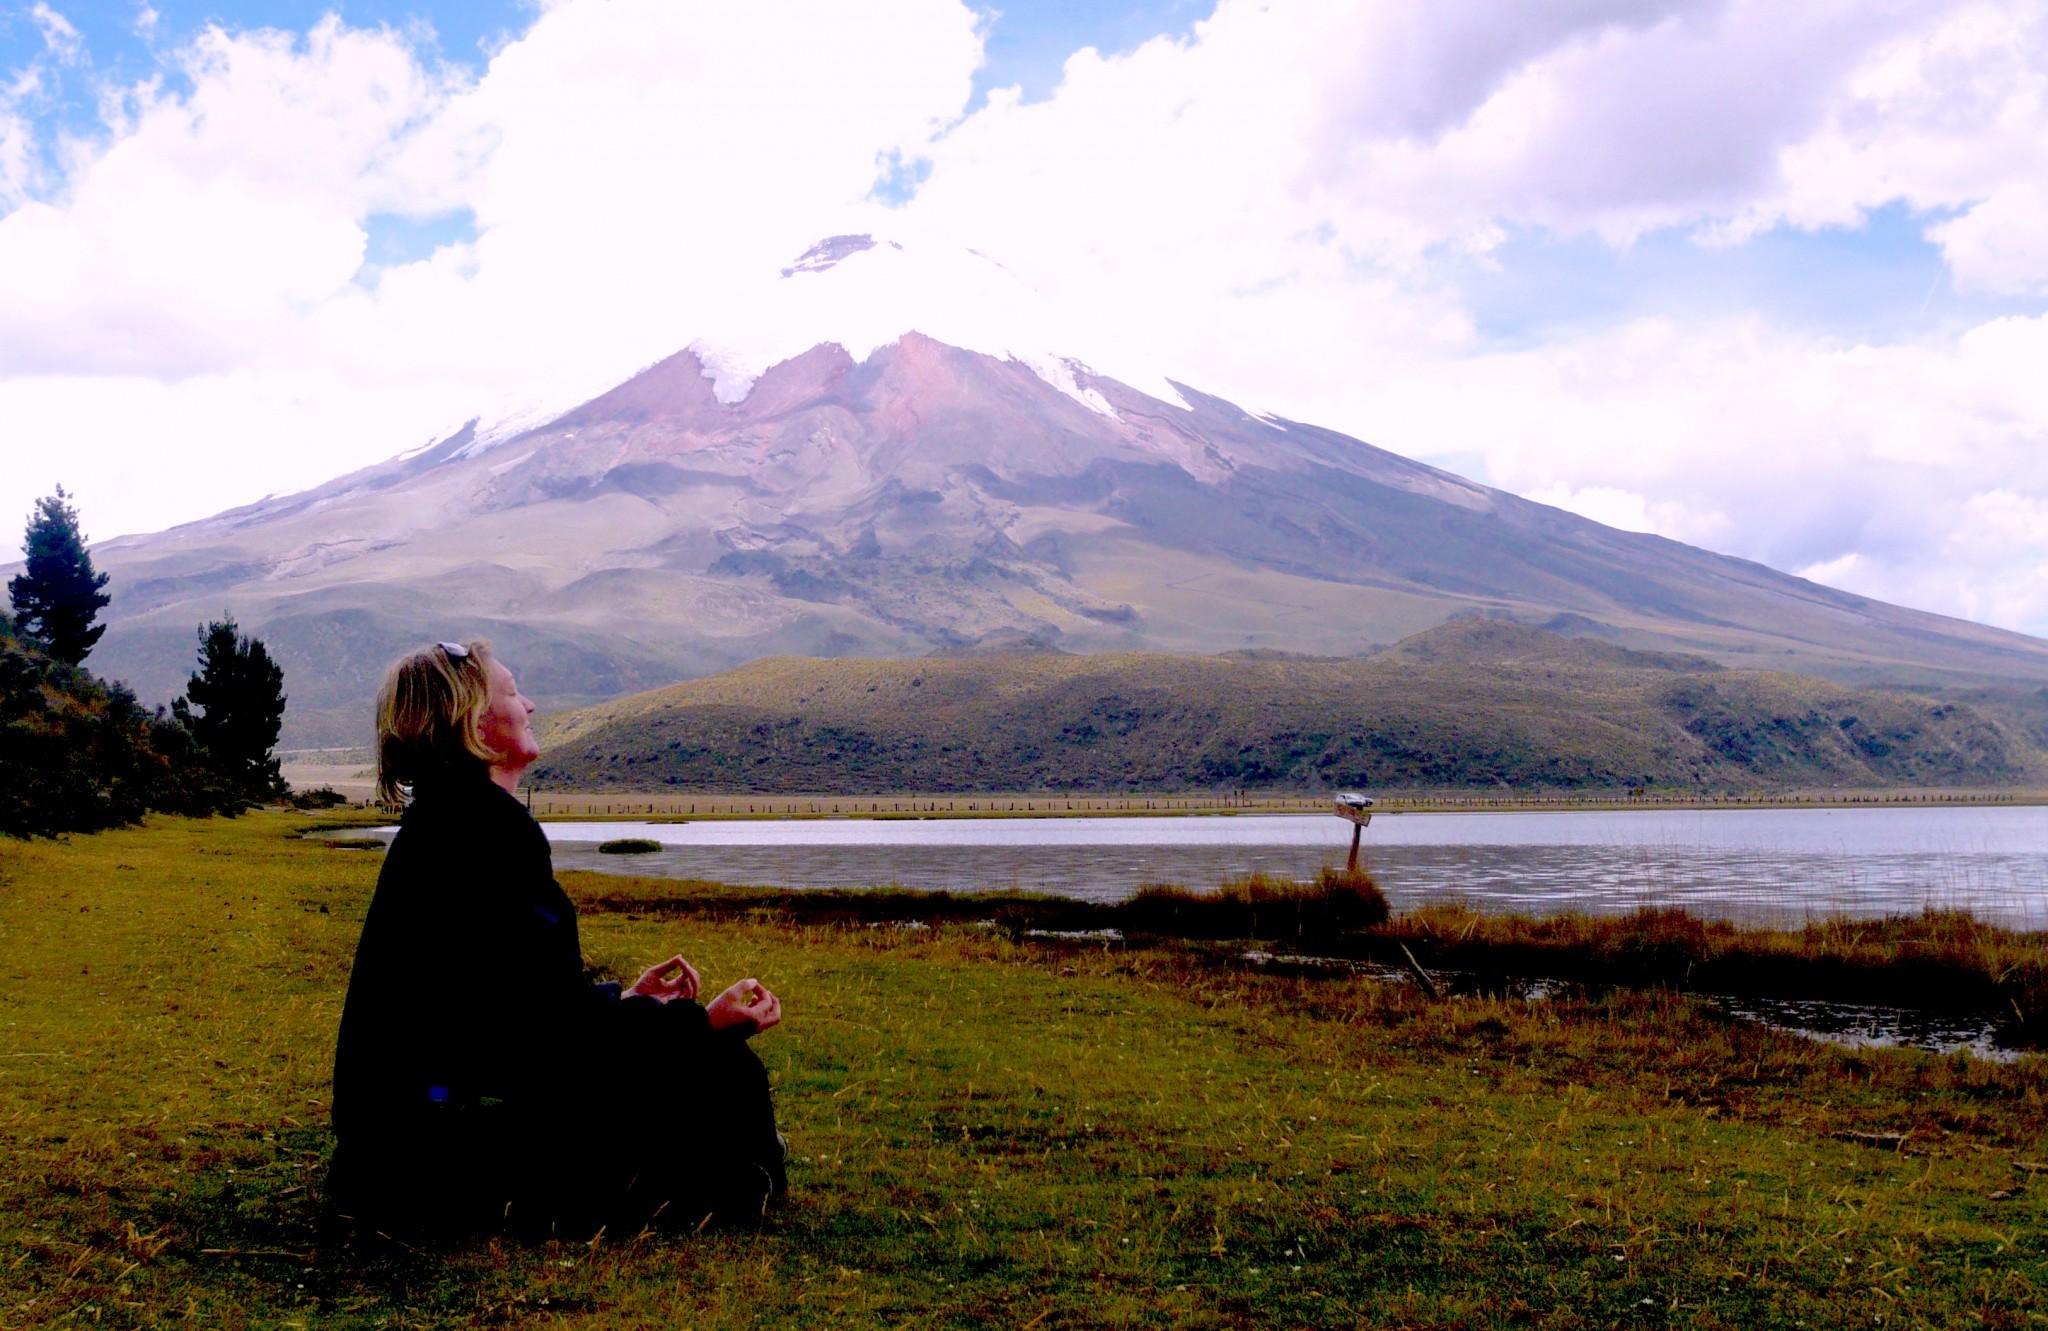 Ecuador-Cotopaxi-Frau-in-Meditation